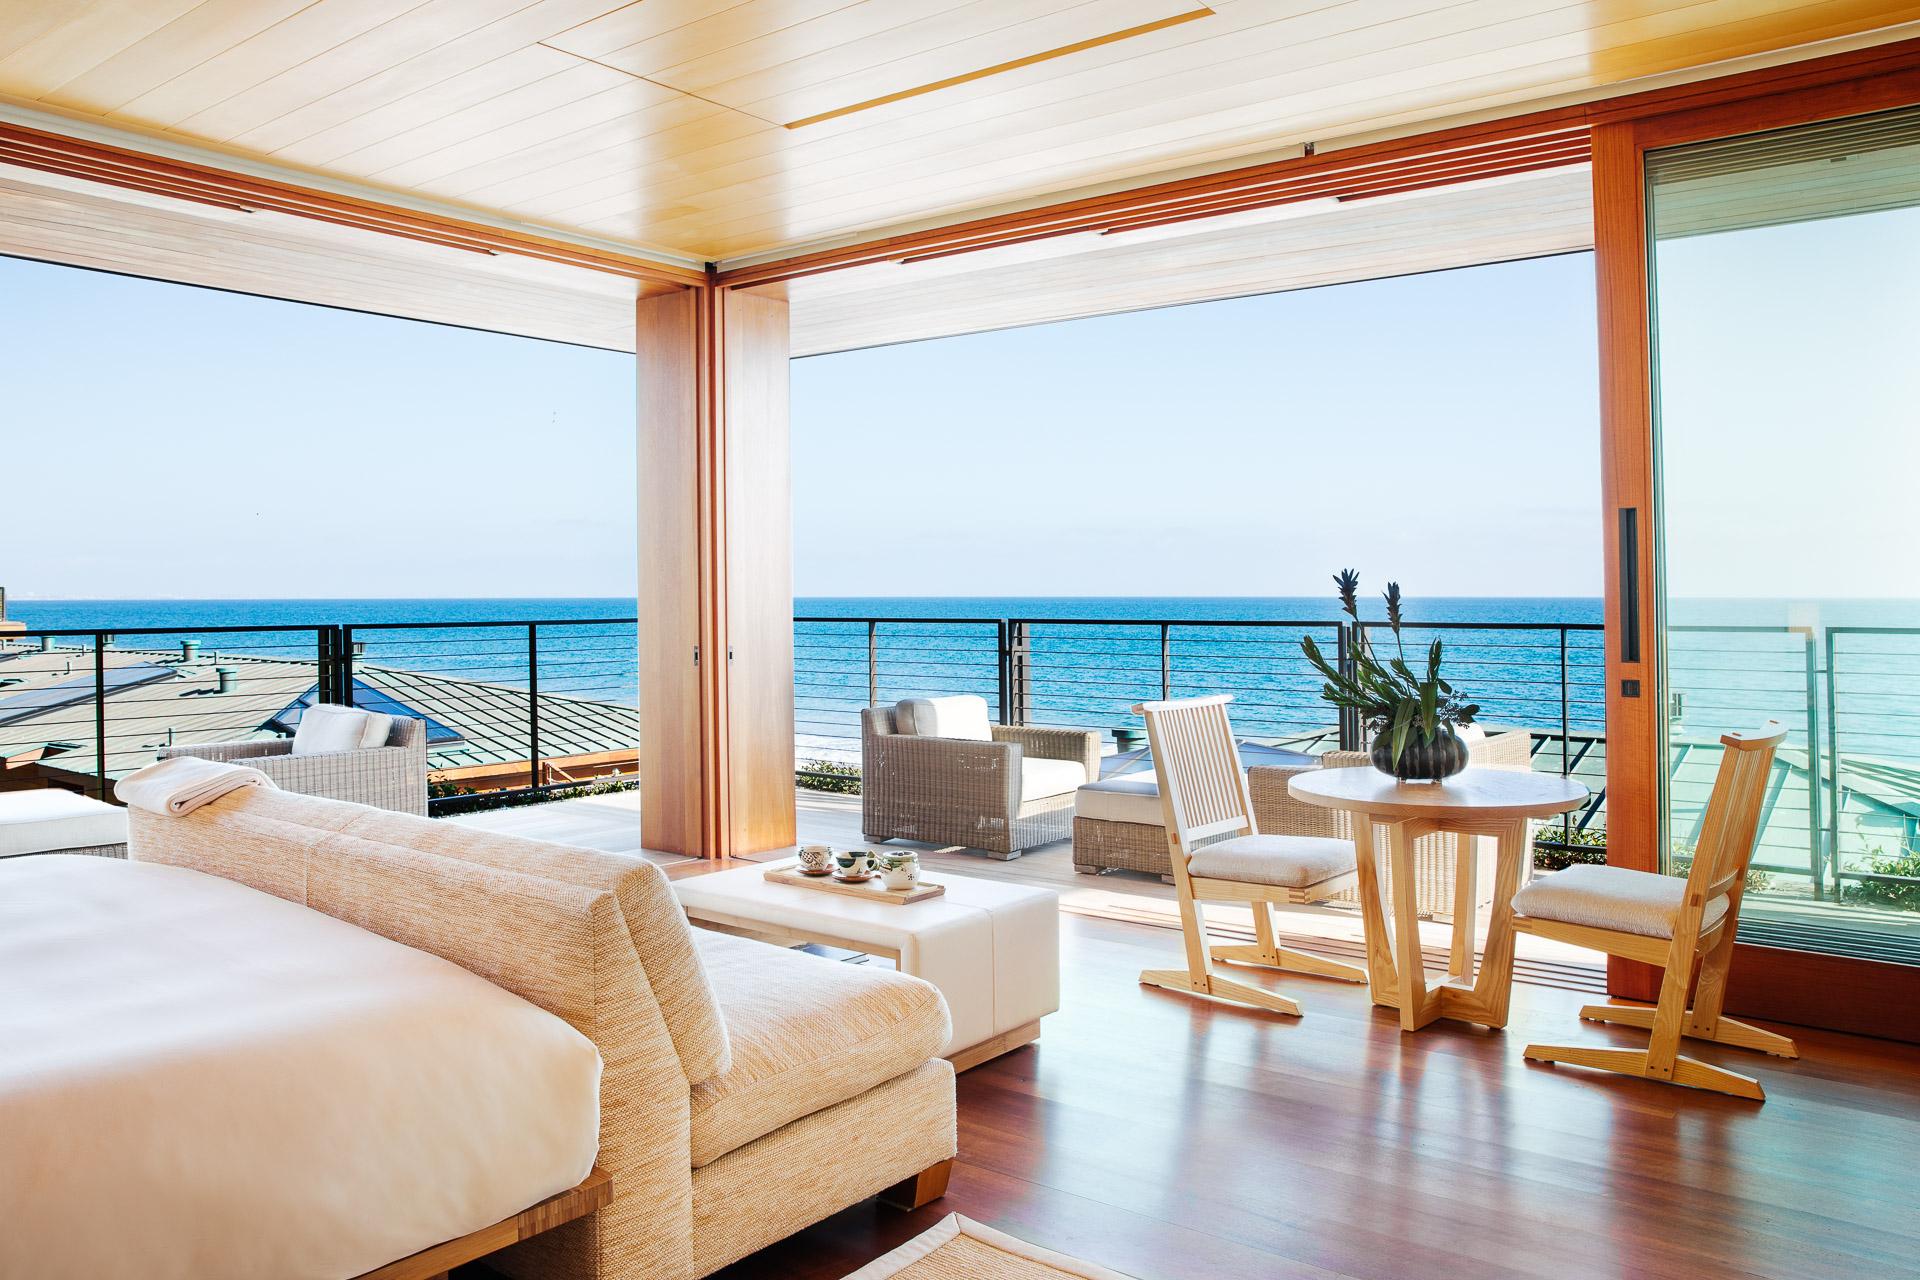 nobu-ryokan-malibu-california-luxury-hotel-photographer-los-angeles-1.jpg